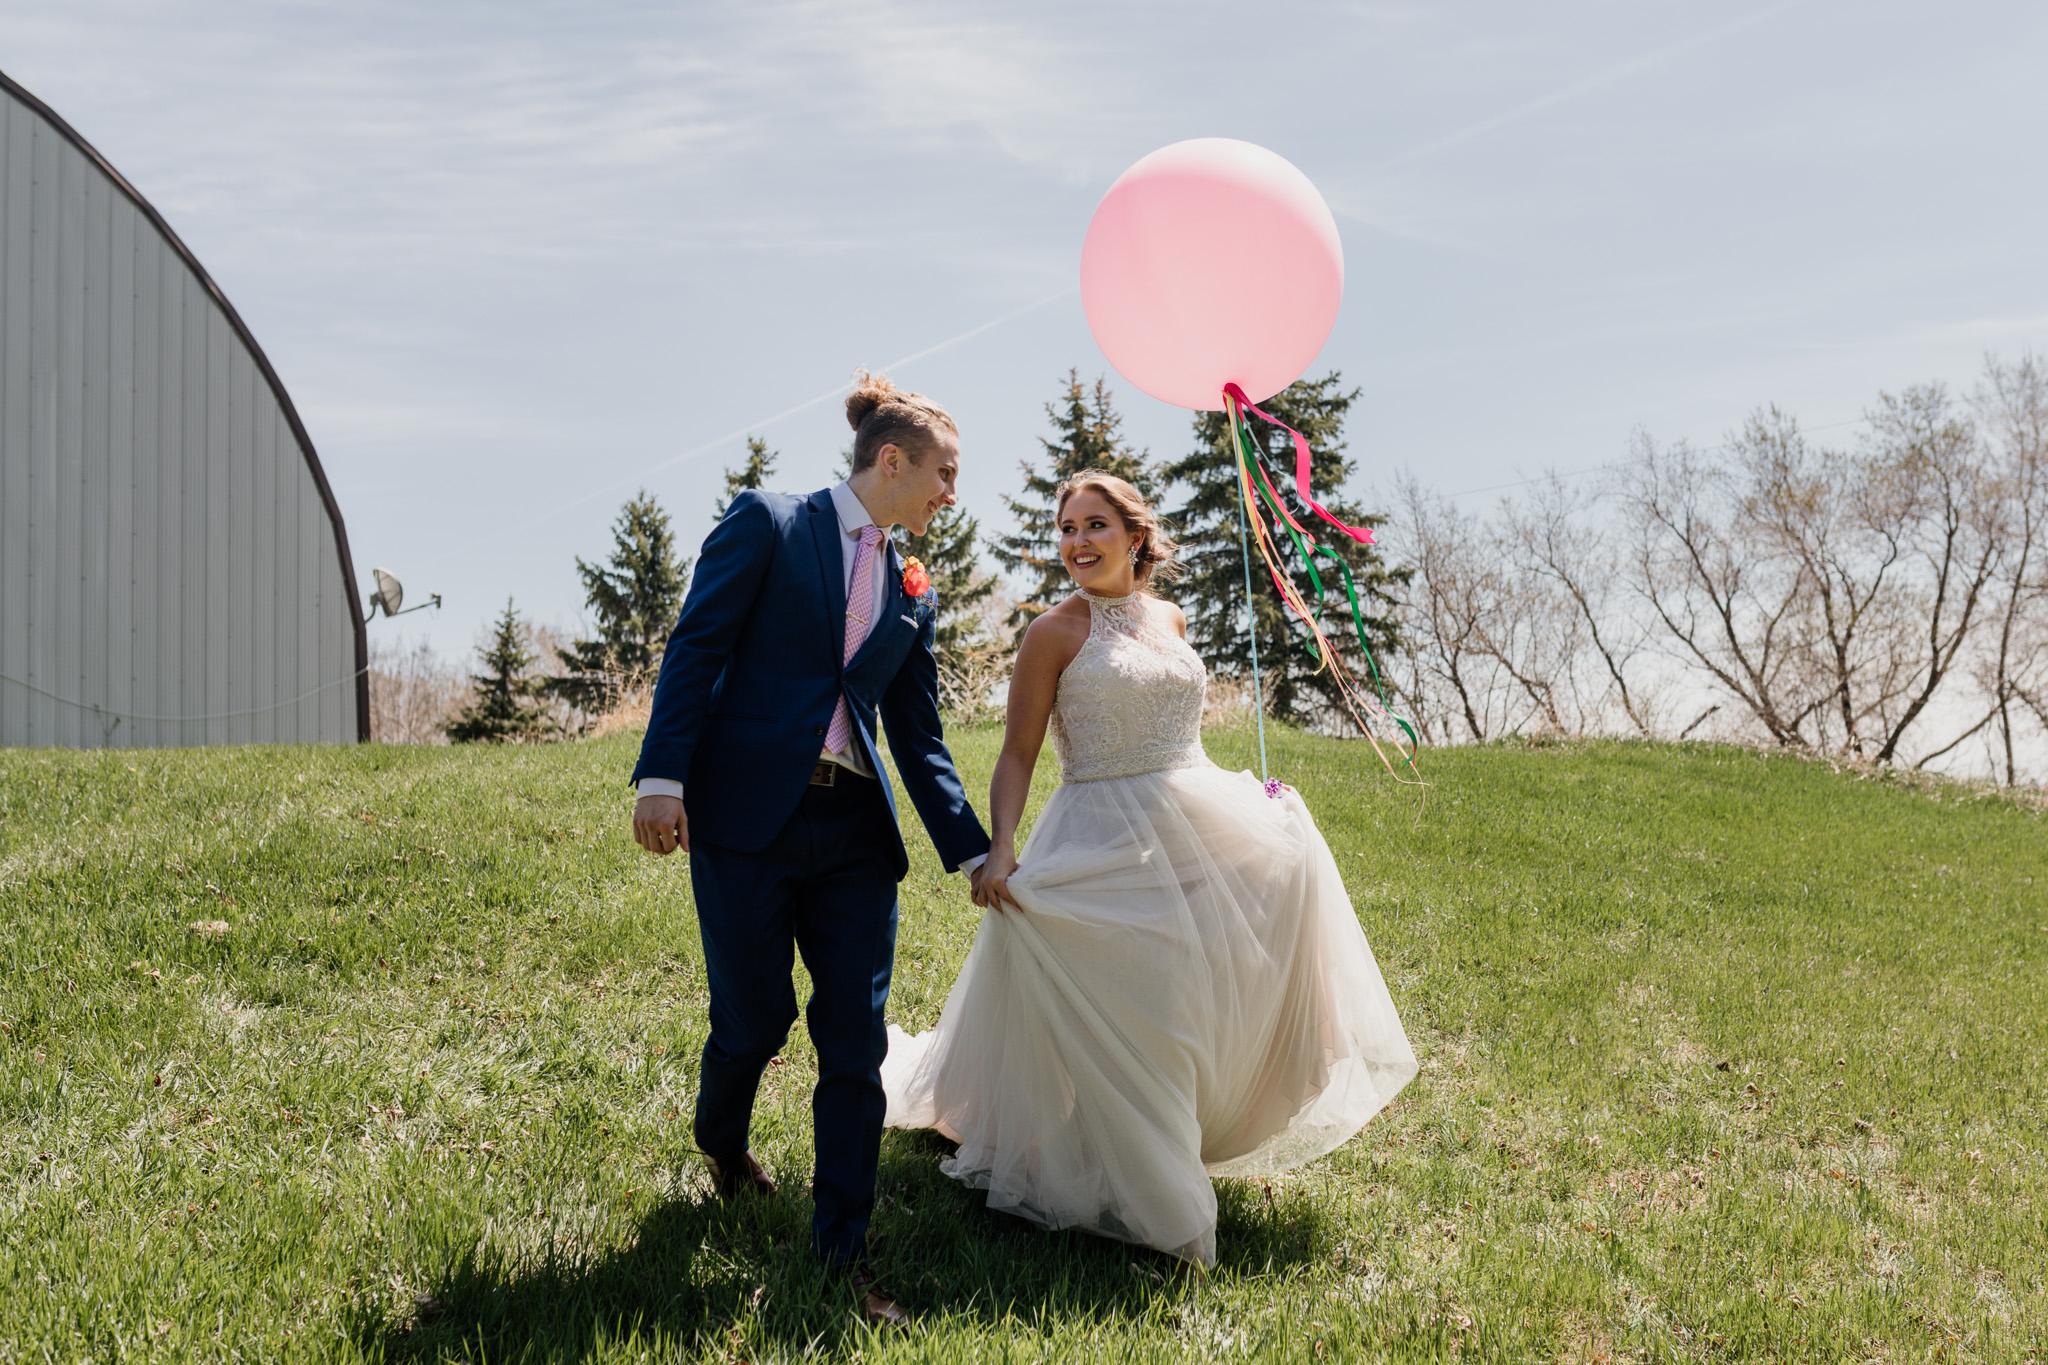 winnipeg-wedding-starlit point-21.jpg